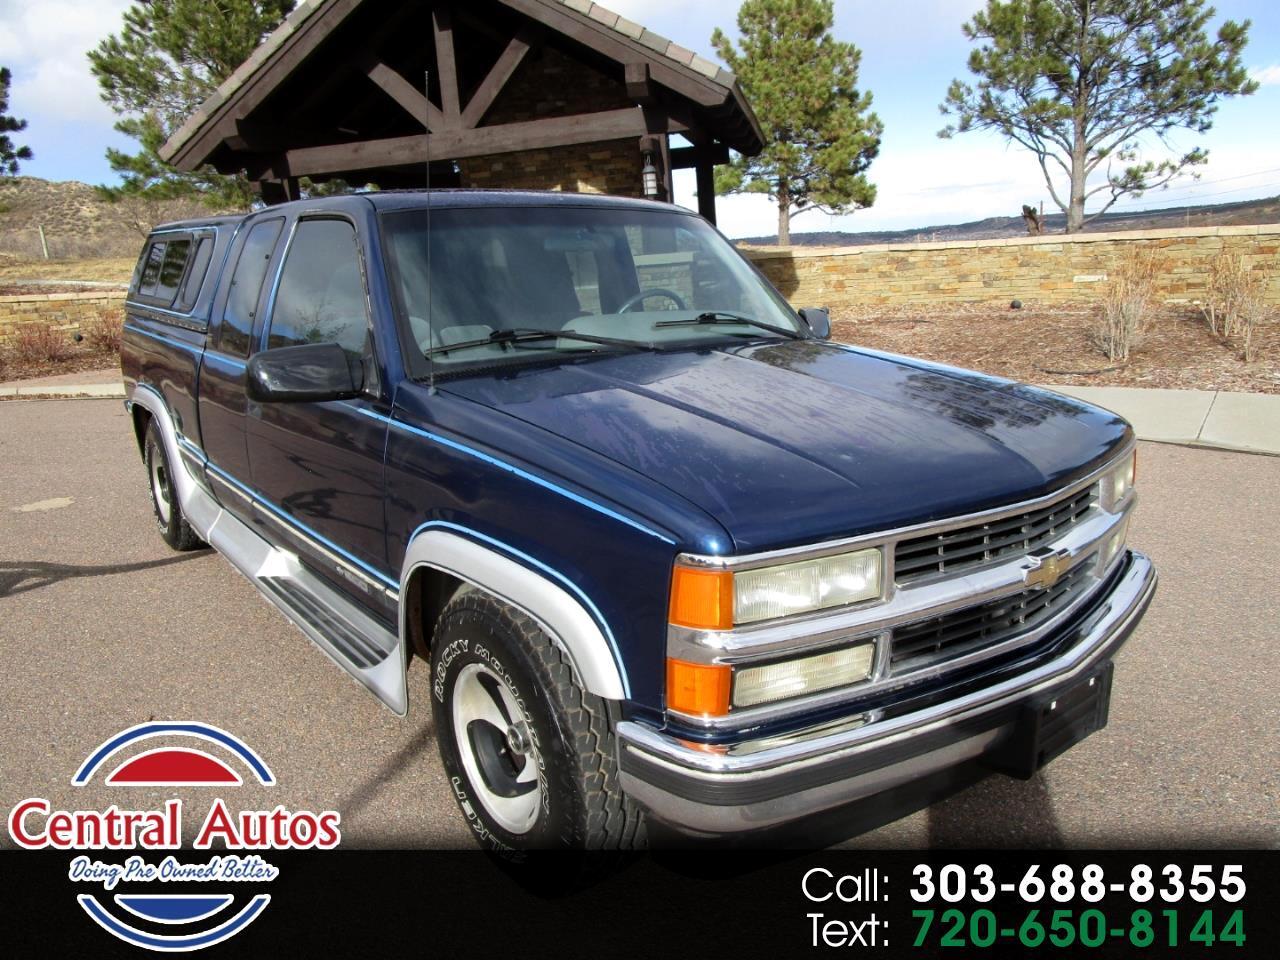 "1995 Chevrolet C/K 1500 Ext Cab 141.5"" WB"